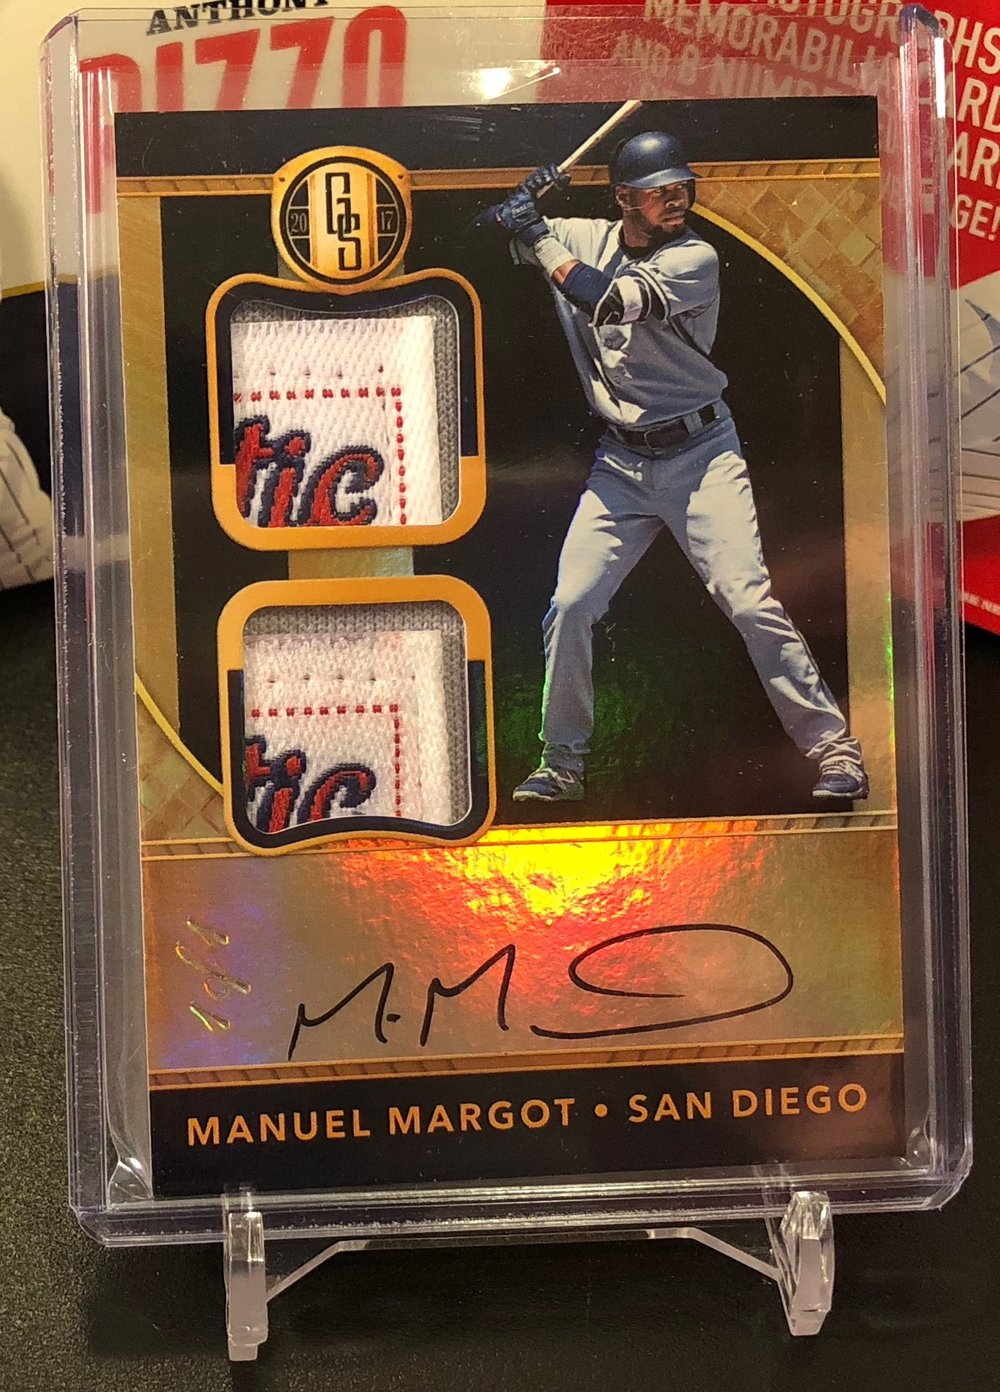 2017 Panini Chronicles Manuel Margot Gold Standard Dual Prime Tags Auto 1/1